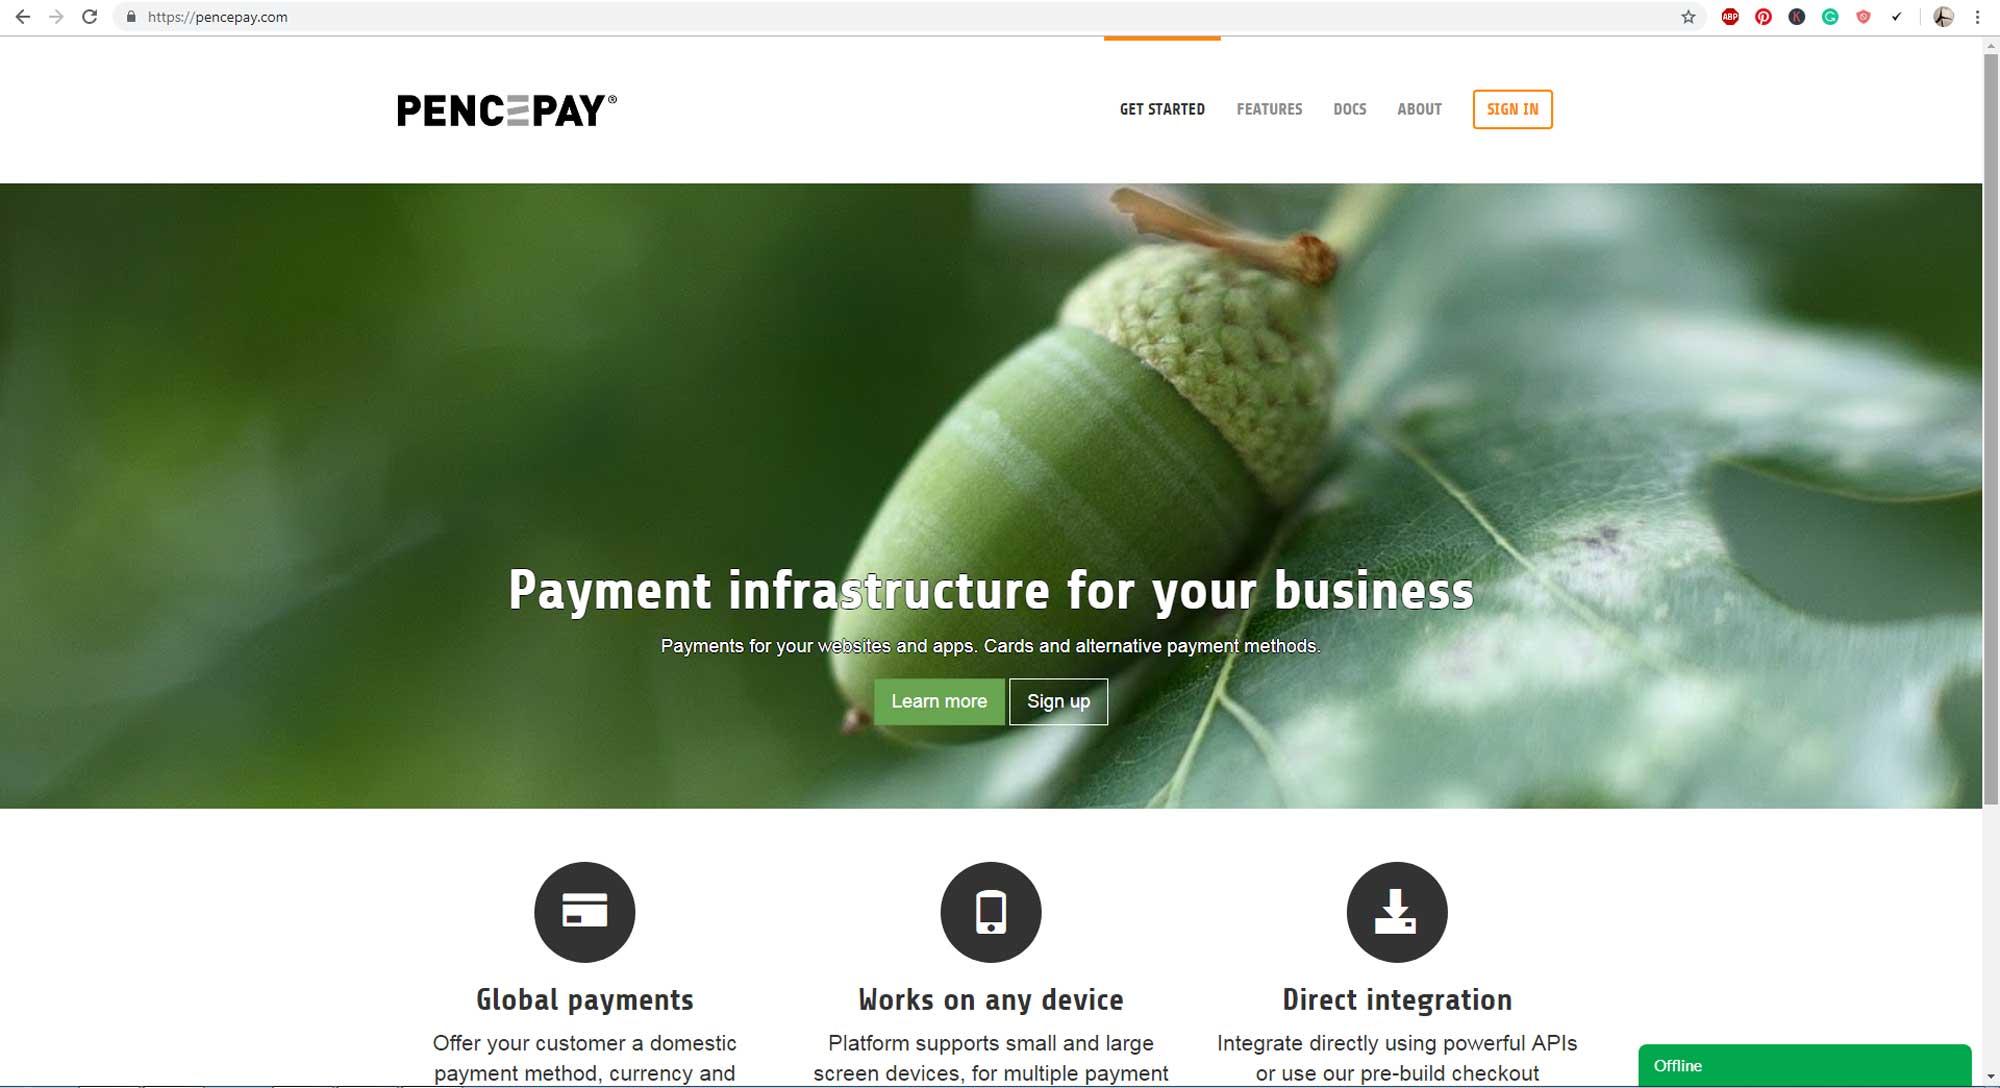 Online plaćanje smještaja: Top 5 payment gateway sistema u Hrvatskoj Panecpay